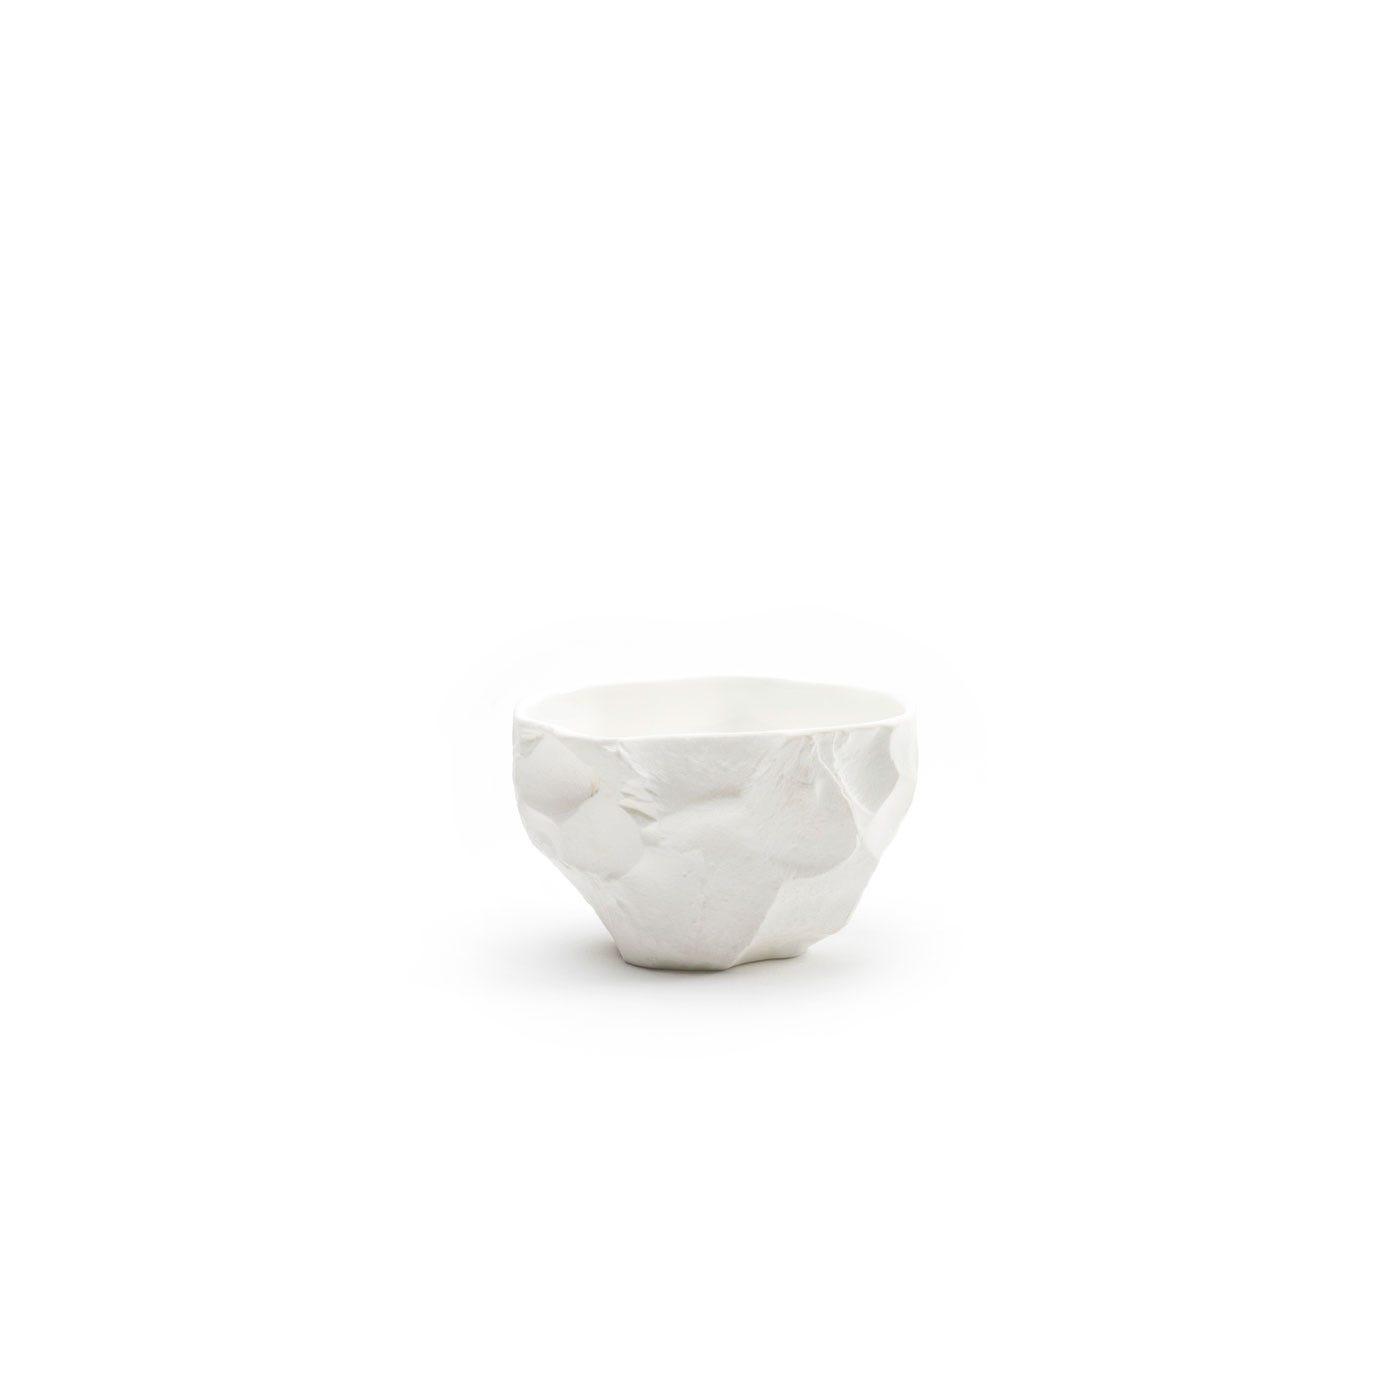 Crockery Bowl Small White